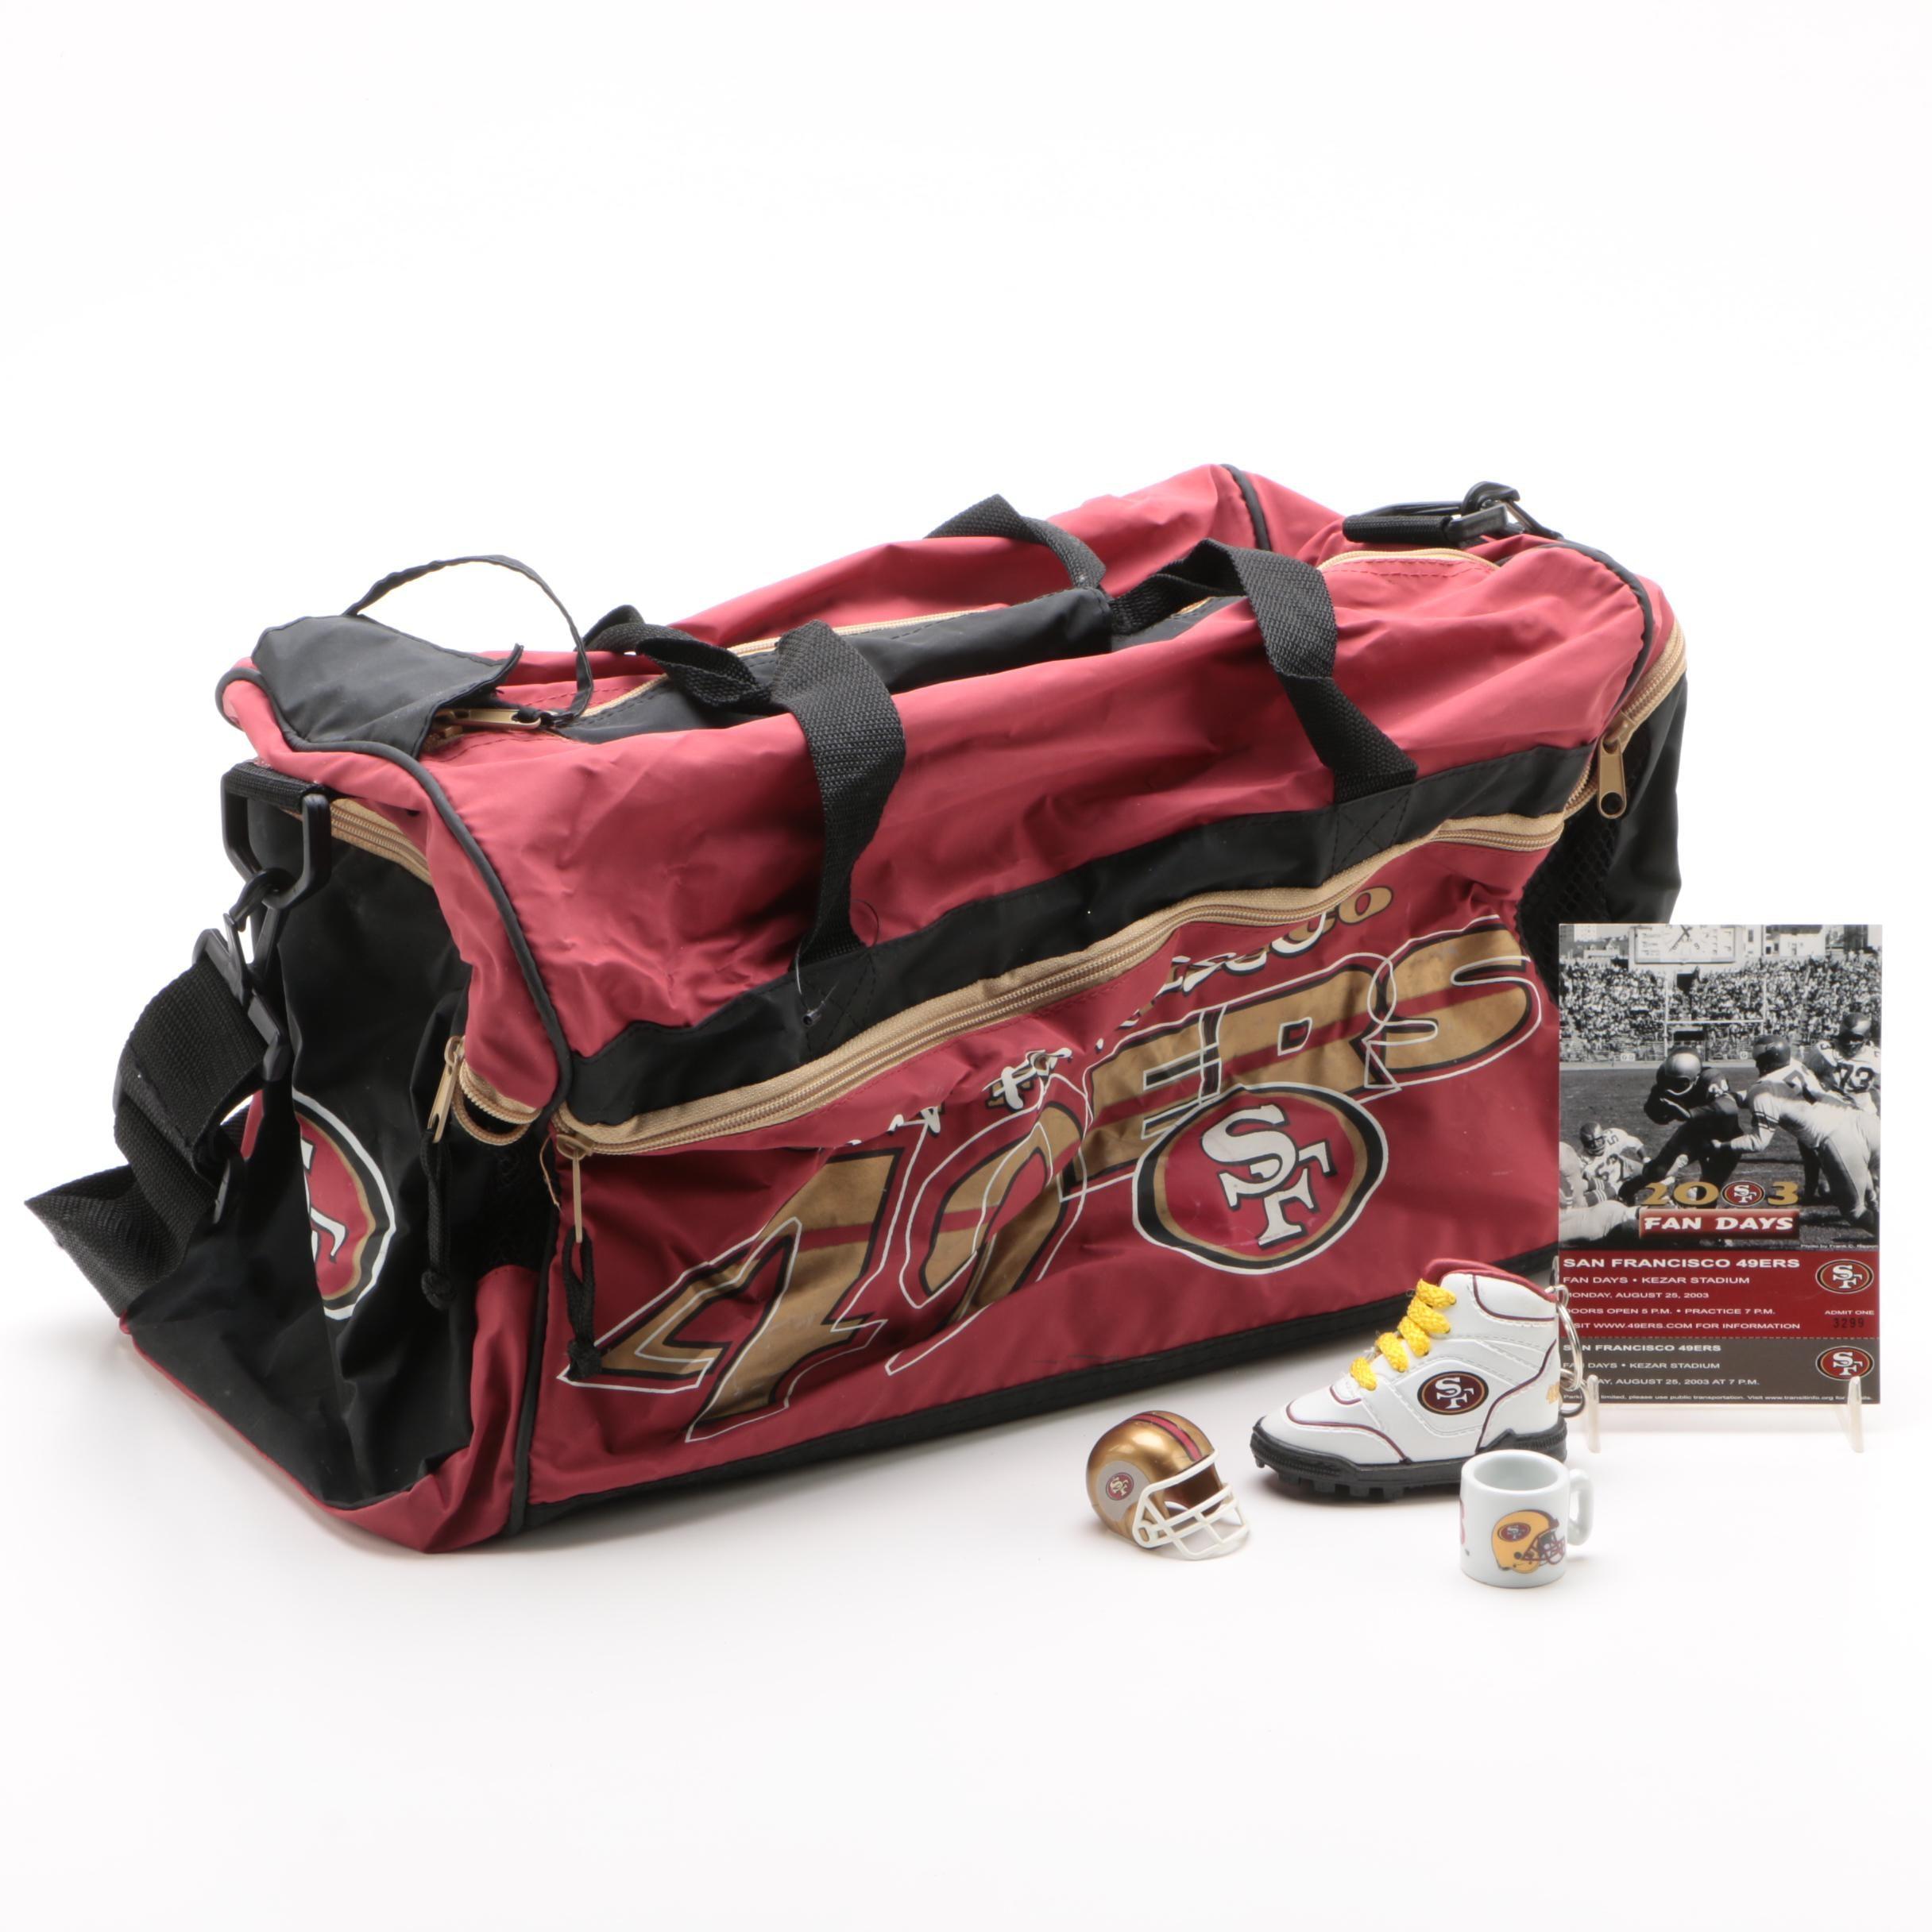 San Francisco 49ers Duffel Bag and Other Memorabilia